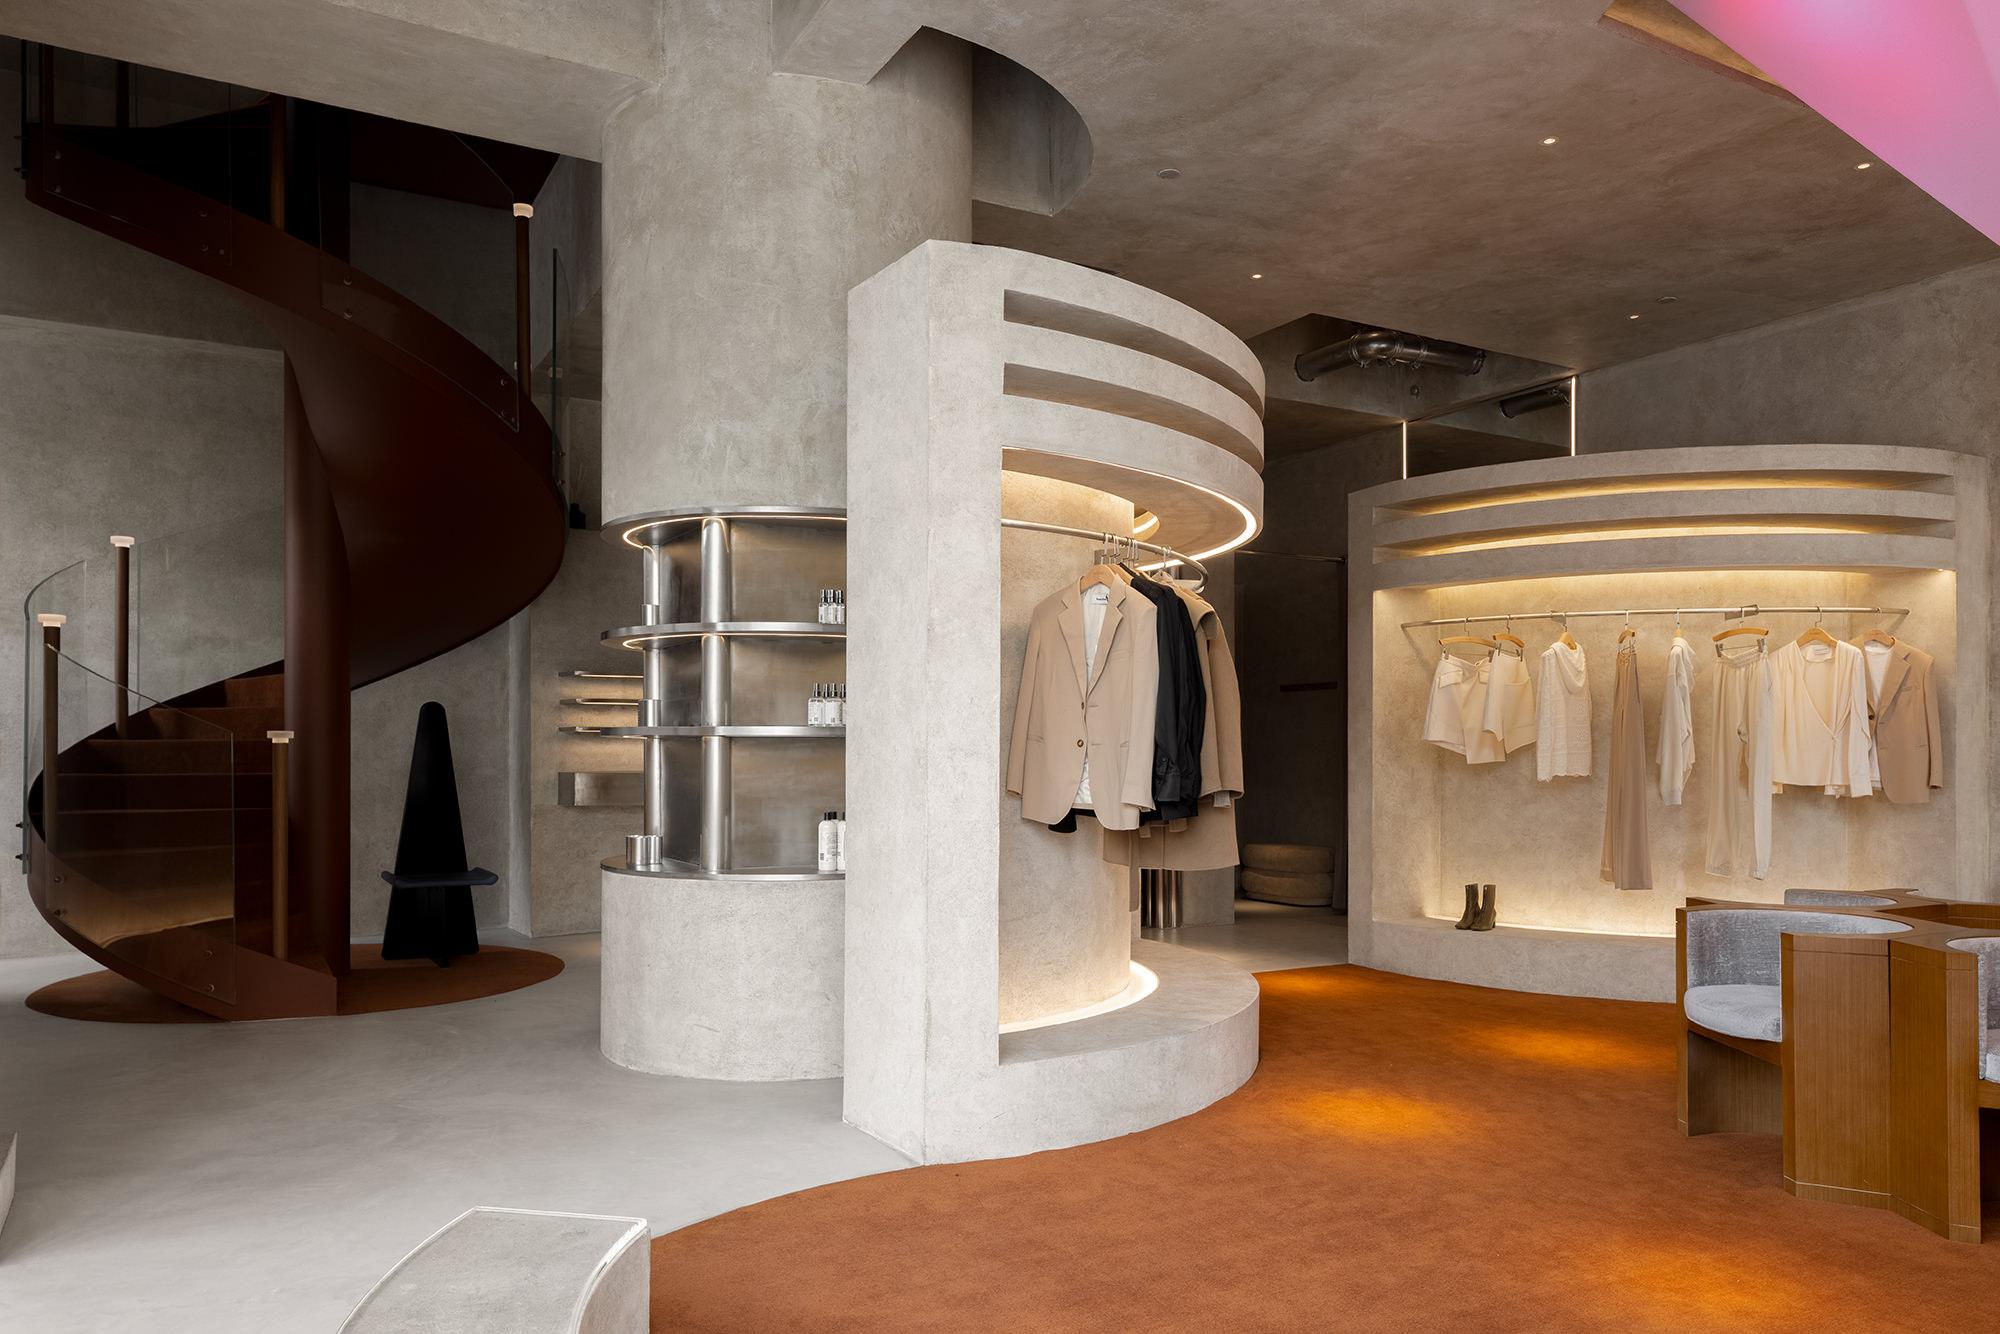 Liang Architecture Studio Audrey Boutique Hangzhou China Luxury Retail Photo Shao Feng Yellowtrace 06